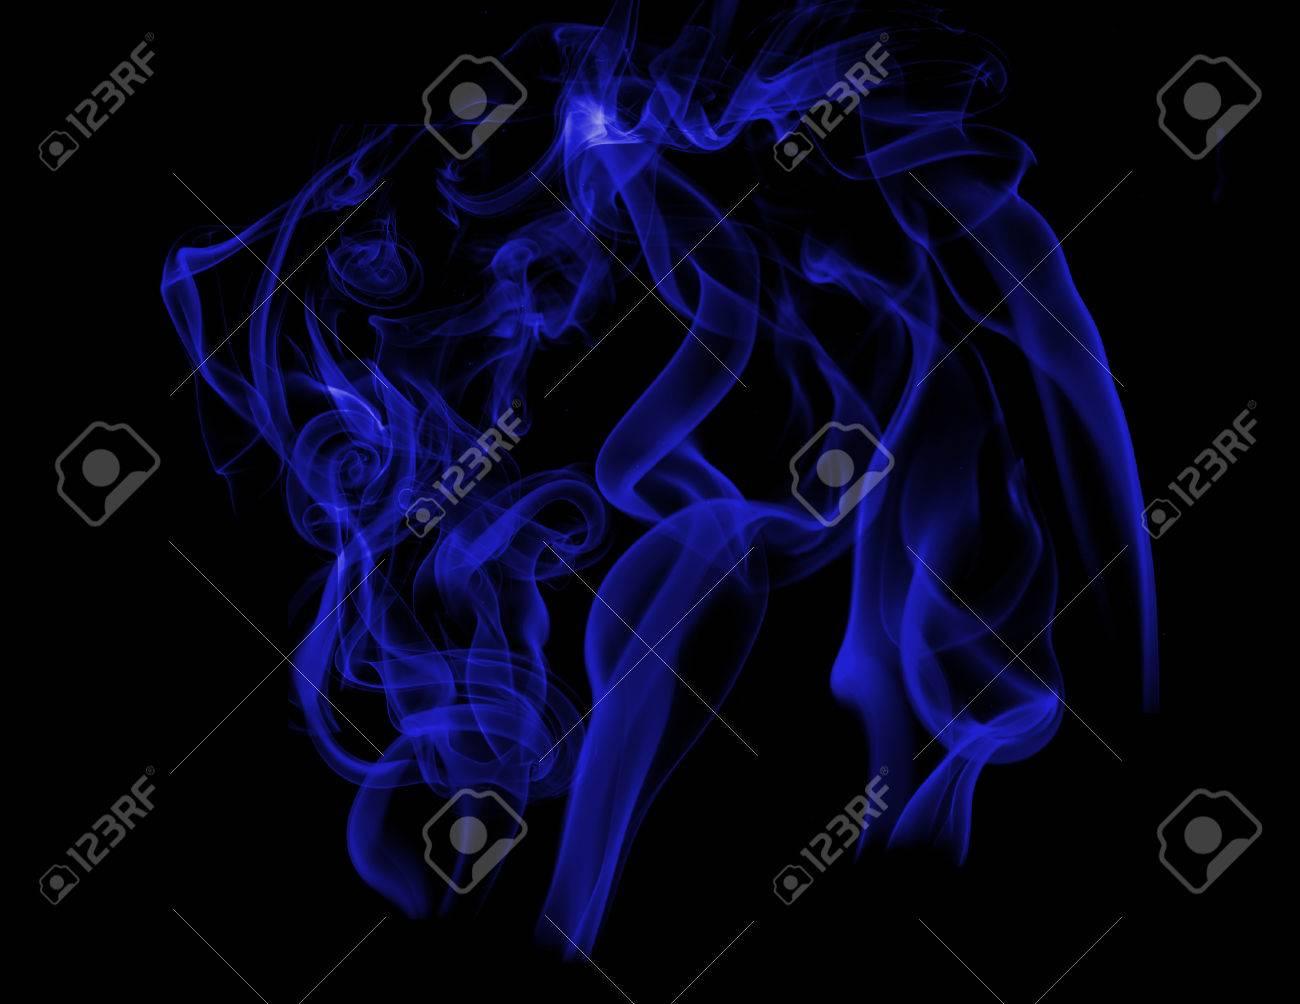 Royal Blue Smoke Stock Vector - 7686157